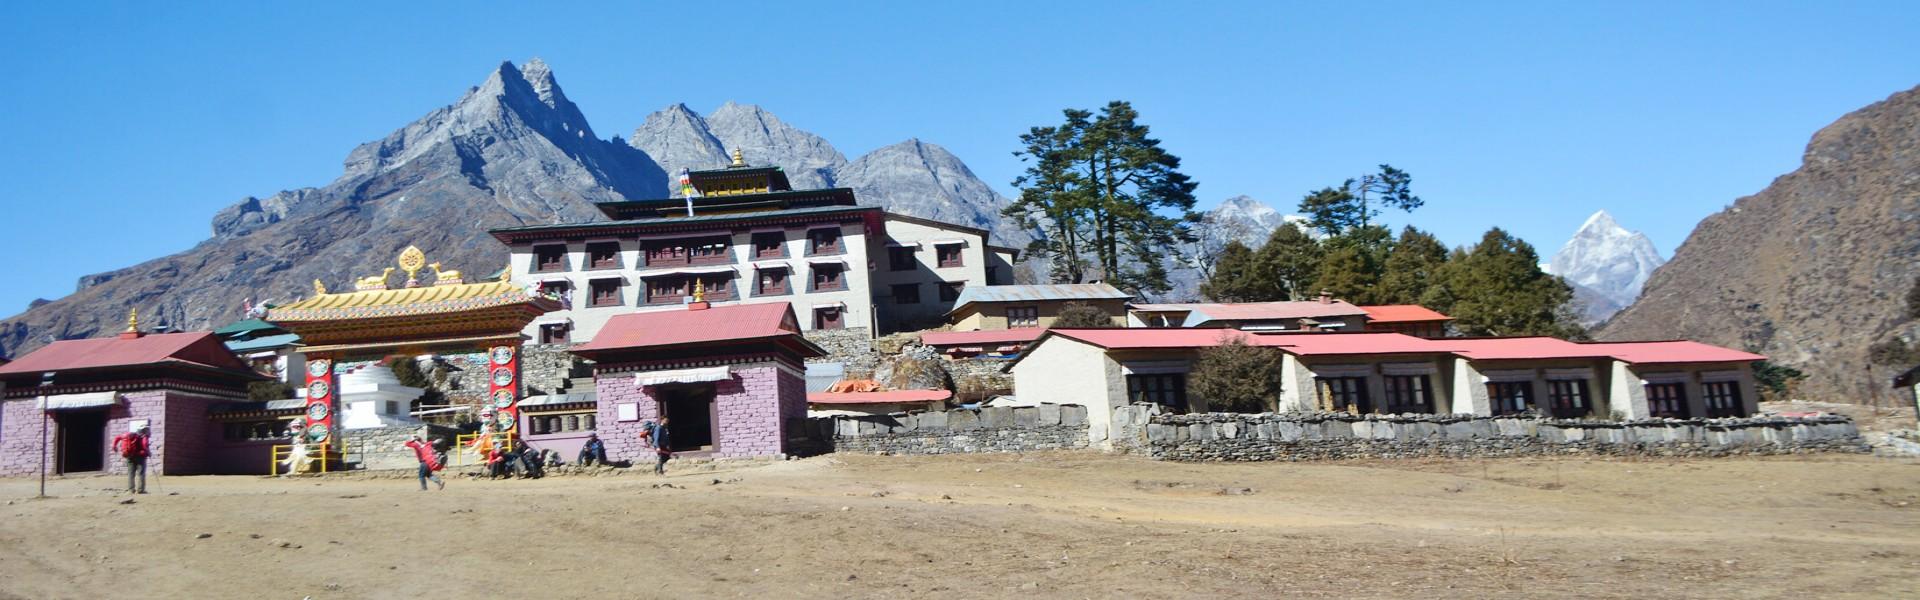 Everest Chola Pass Trek Blog